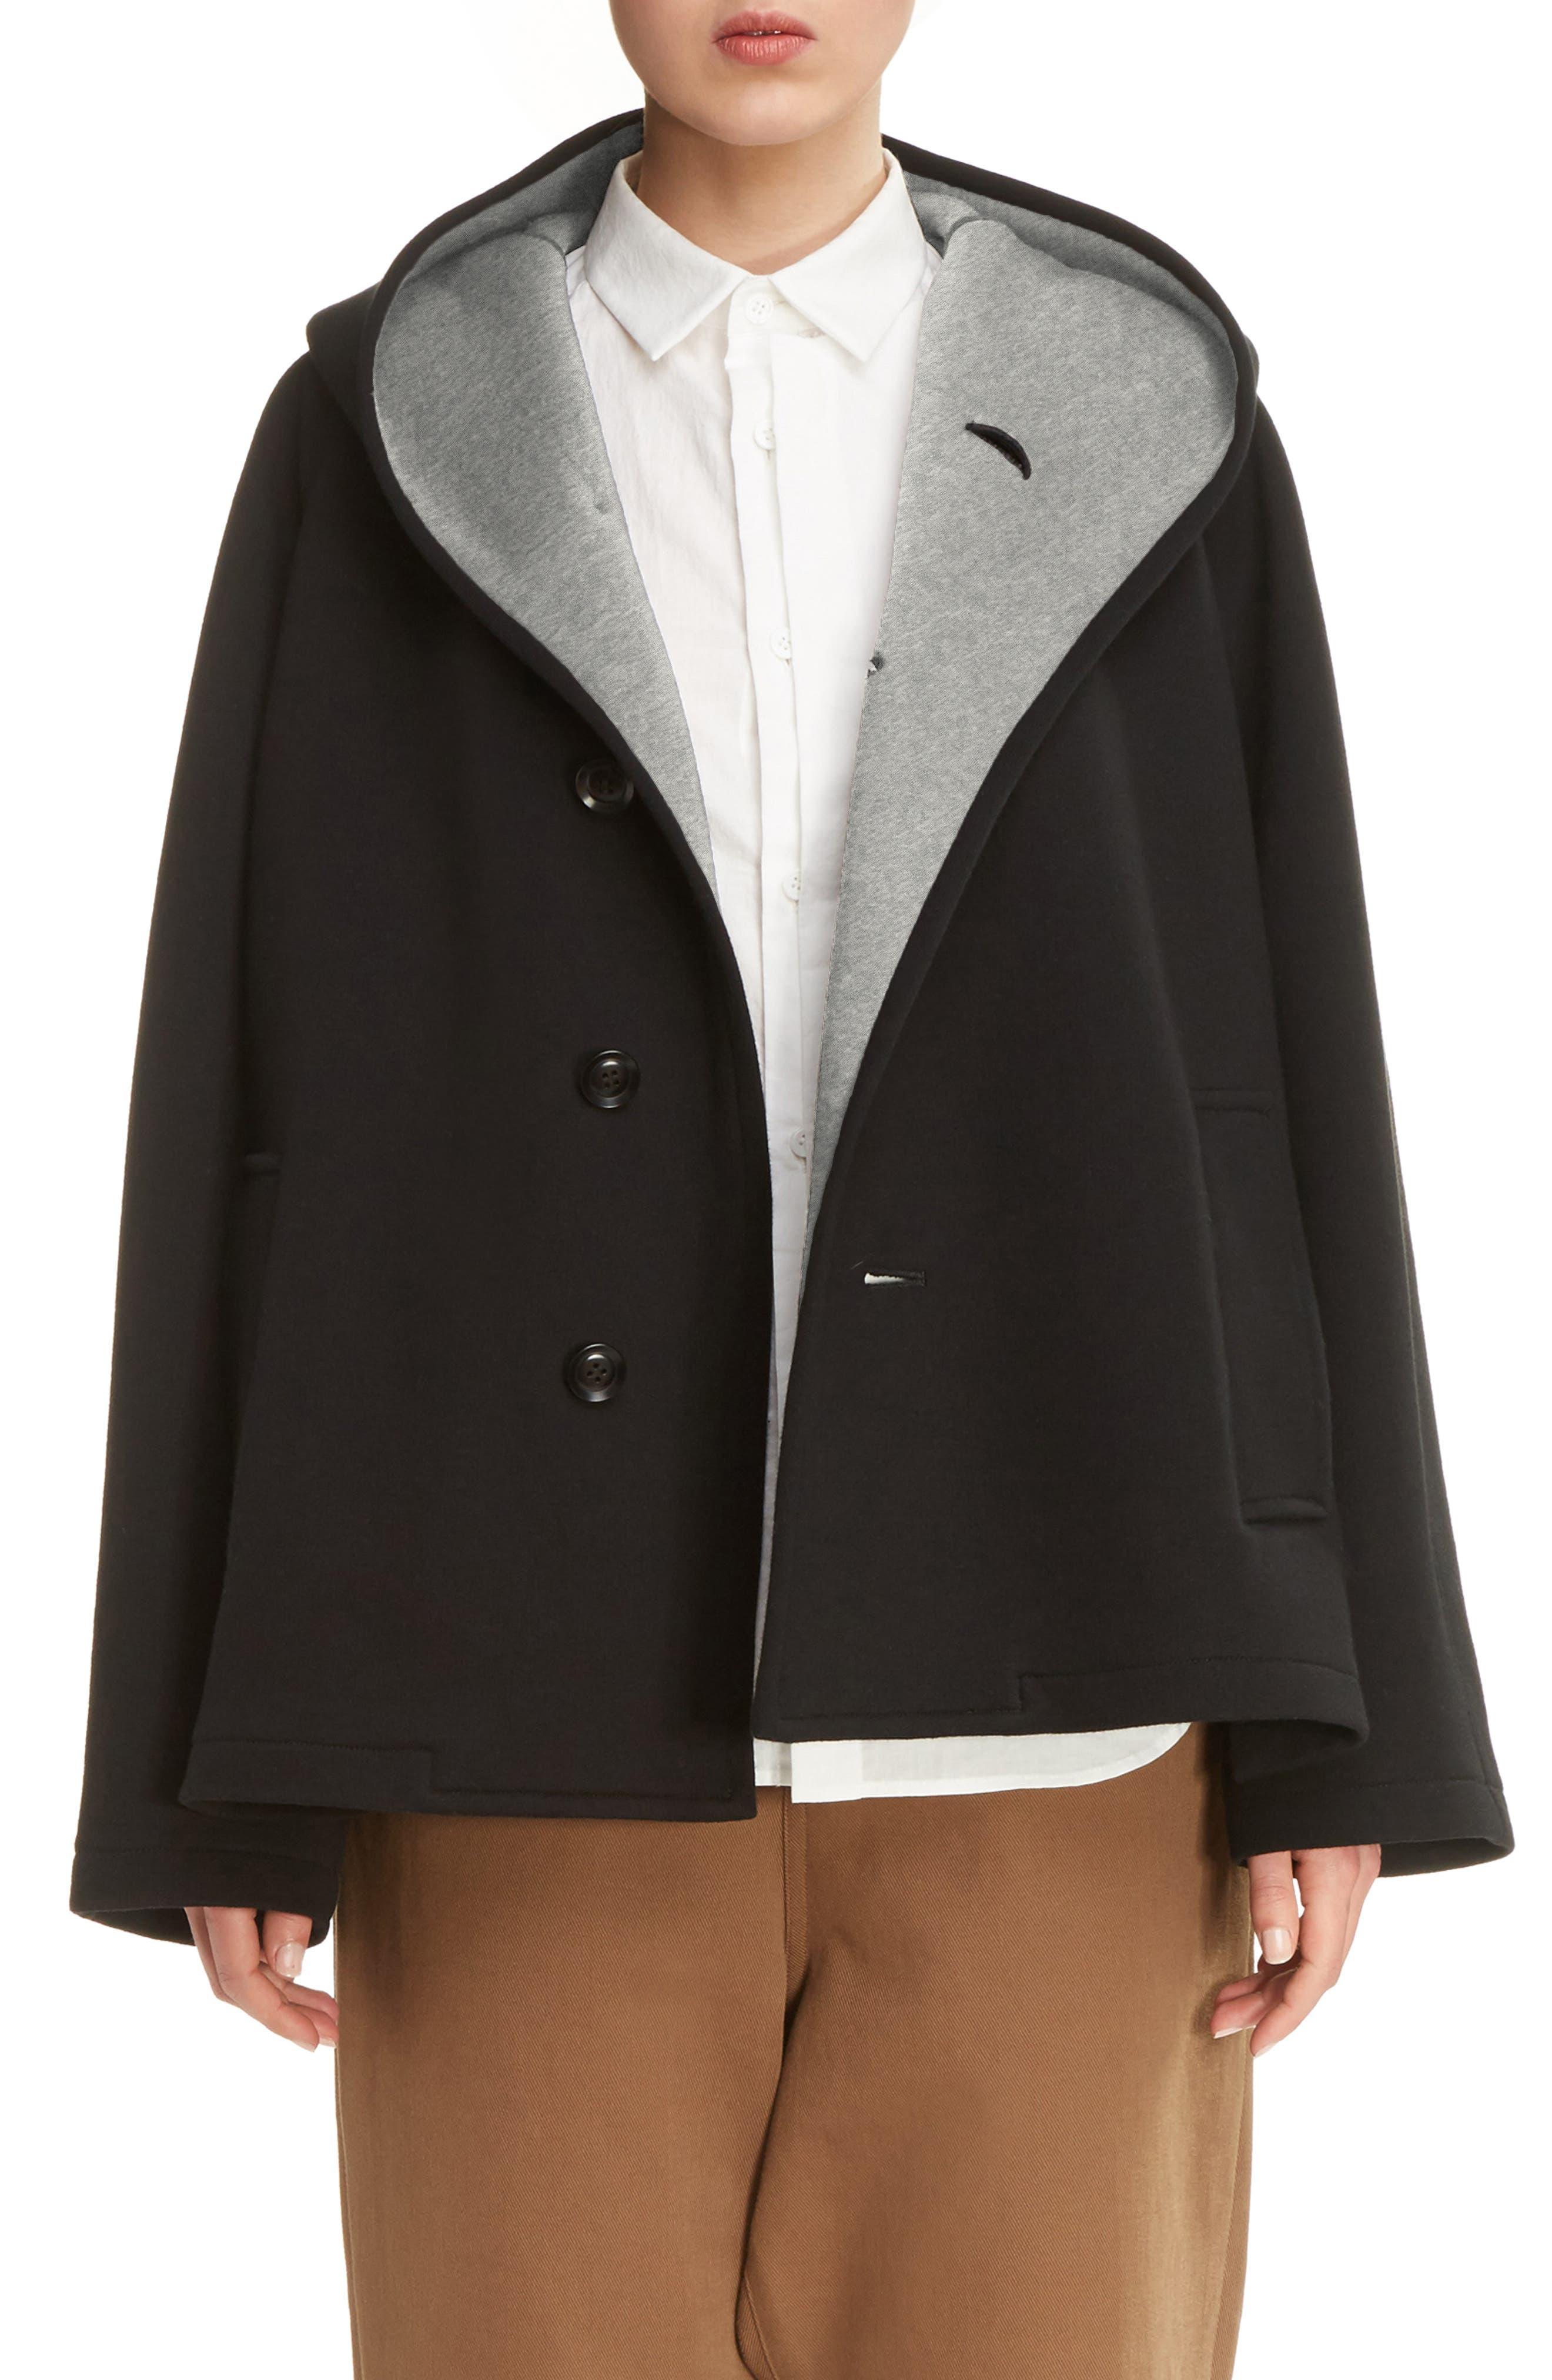 Alternate Image 1 Selected - Y's by Yohji Yamamoto U-Hood Short Jacket